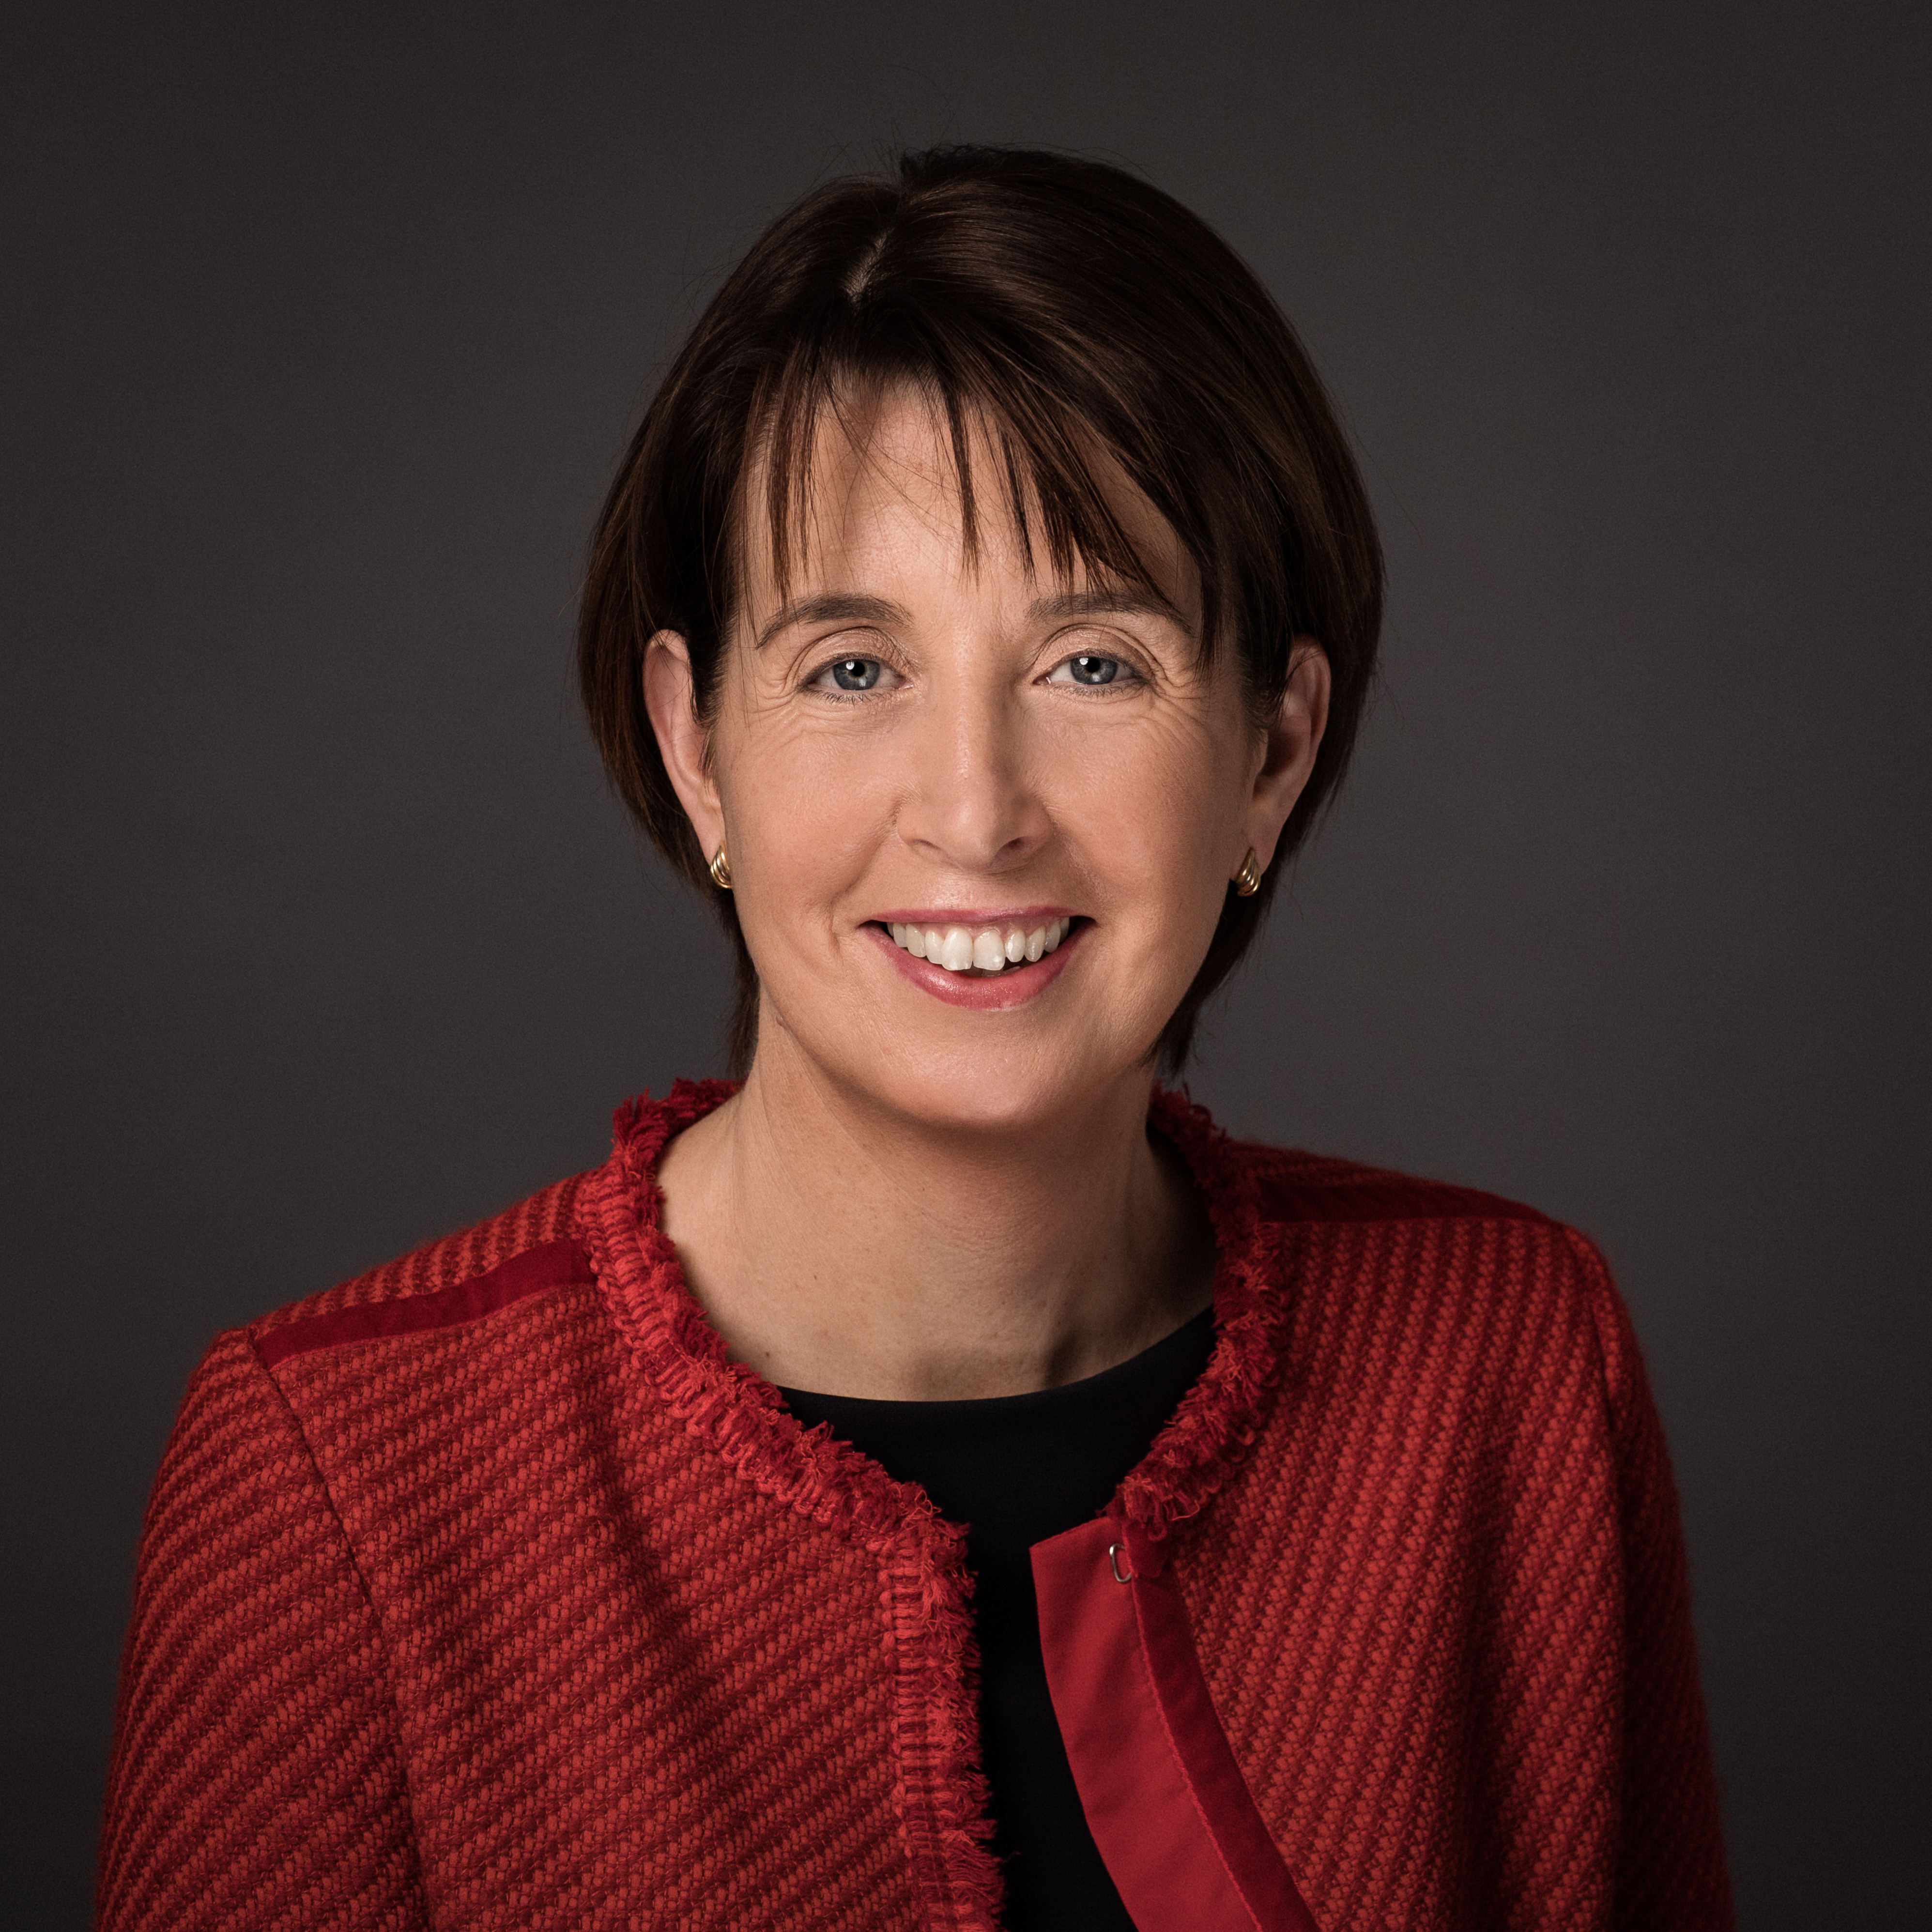 Claire Doyle